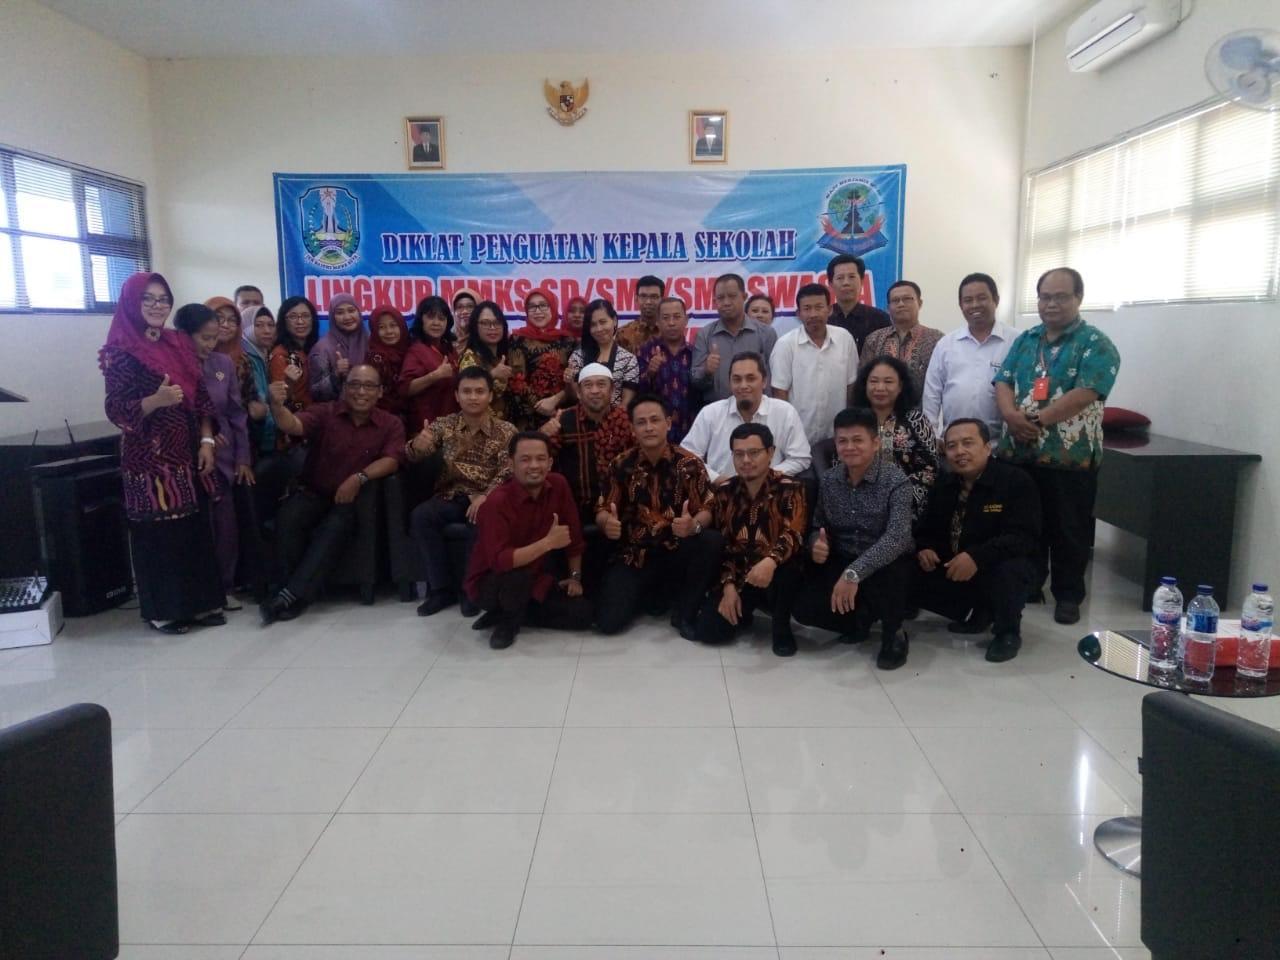 Kepala Sekolah Harus Bersertifikat, Labschool Unesa Kirimkan Dewi Purwanti Ikuti Diklat